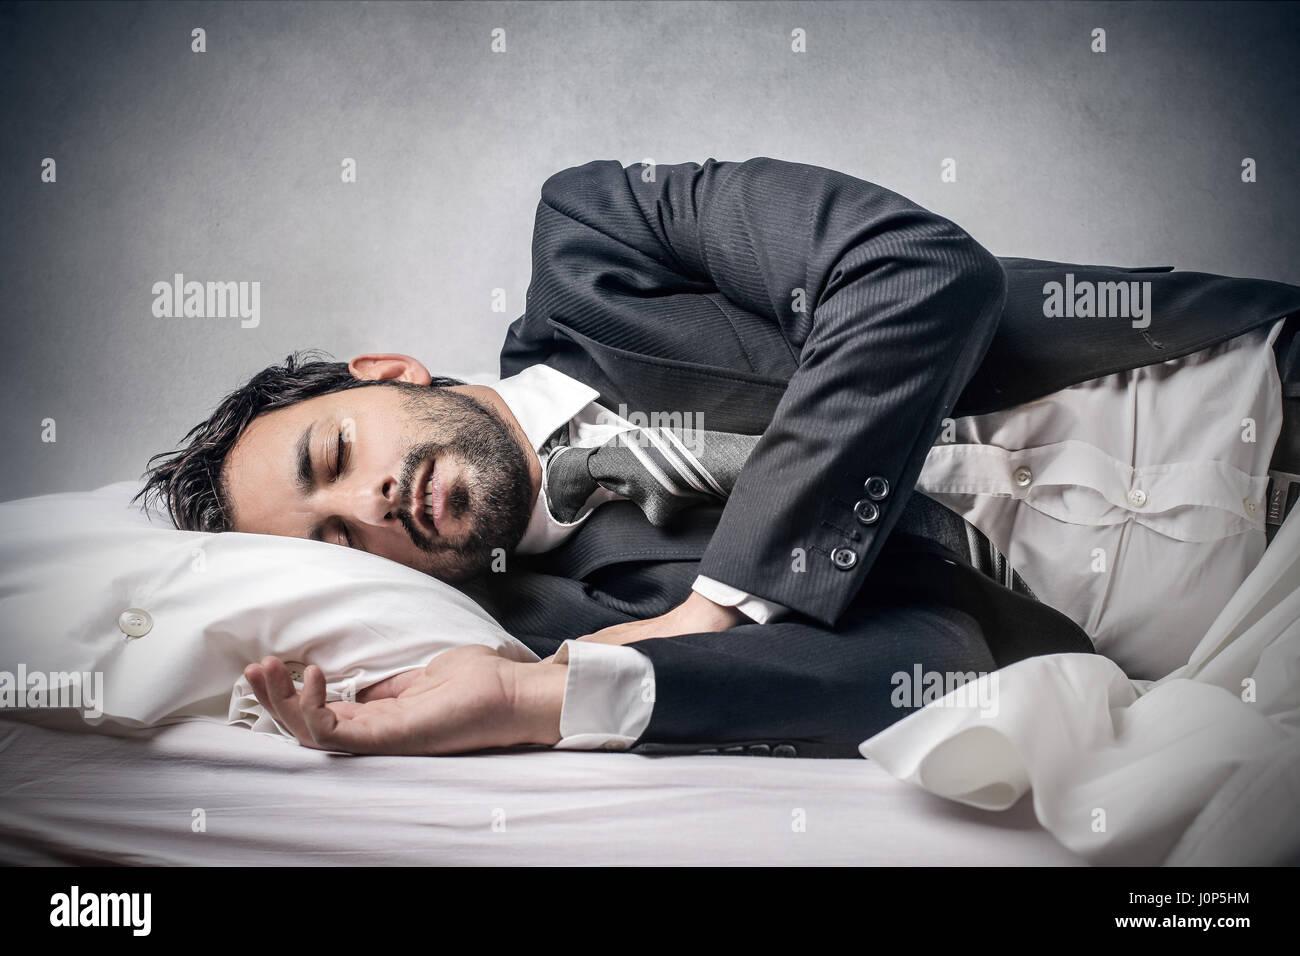 Businessman sleeping on bed - Stock Image